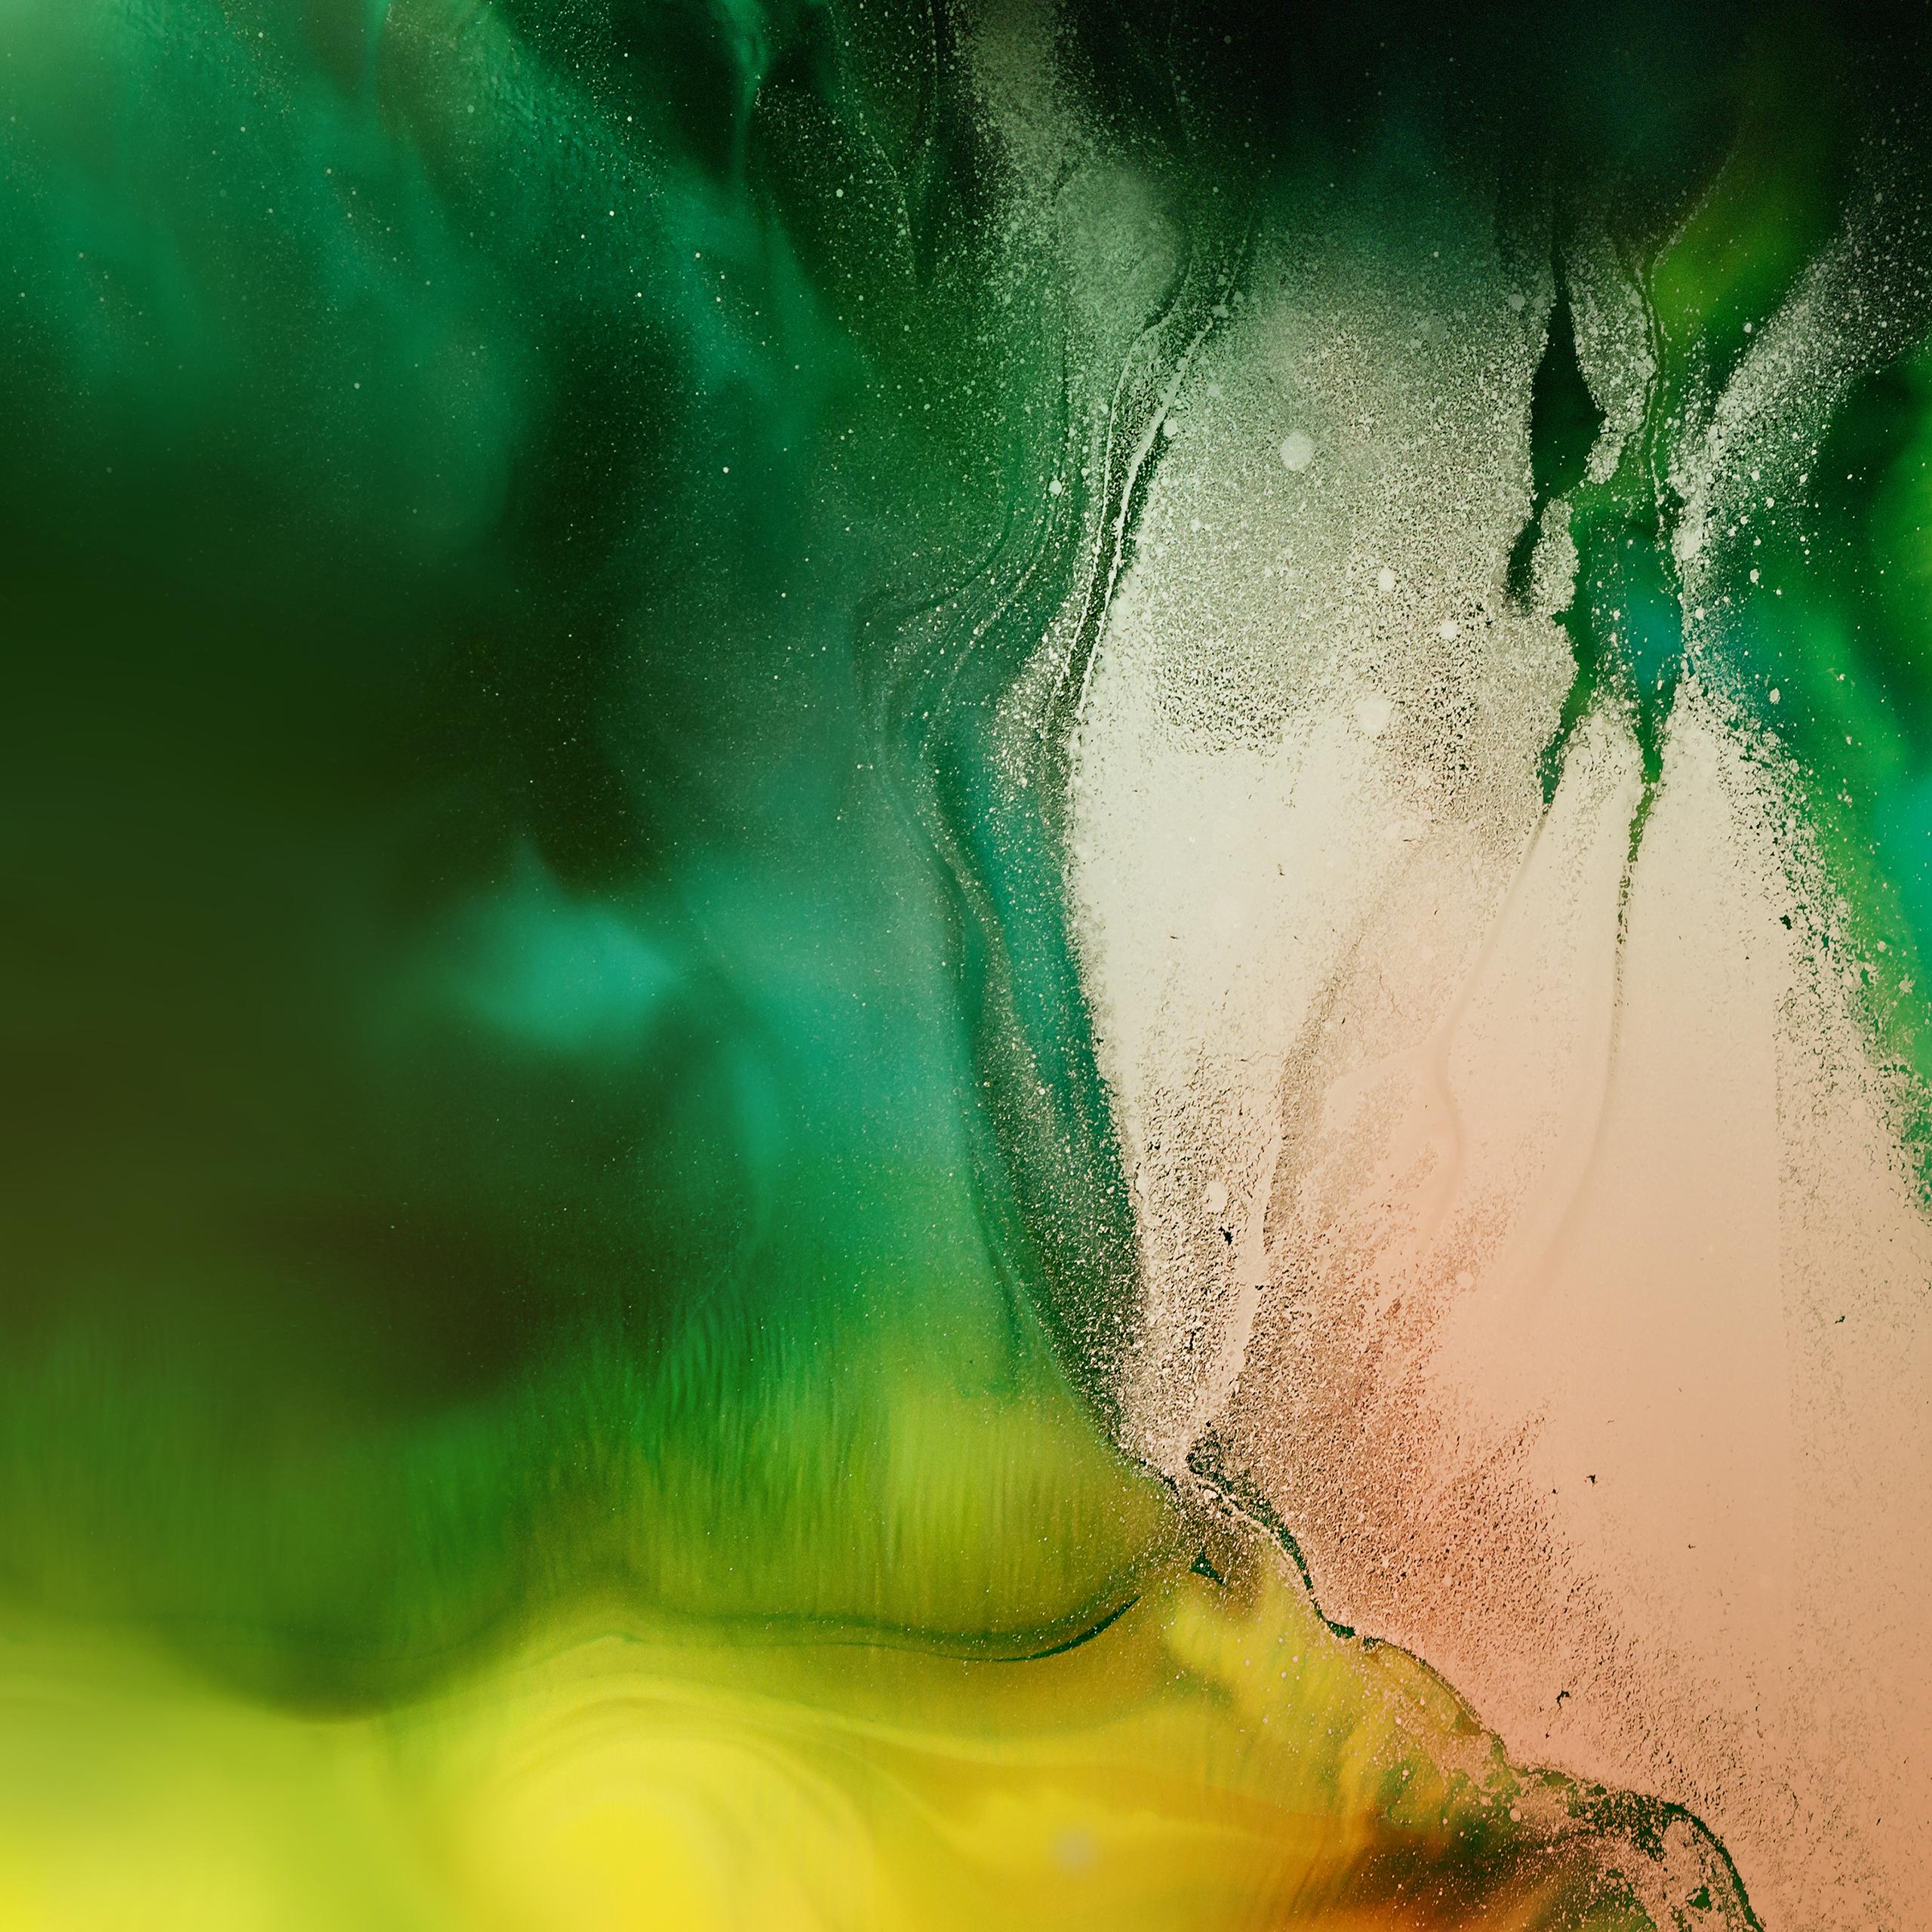 Download Samsung Galaxy S10 5g Wallpaper Sammobile